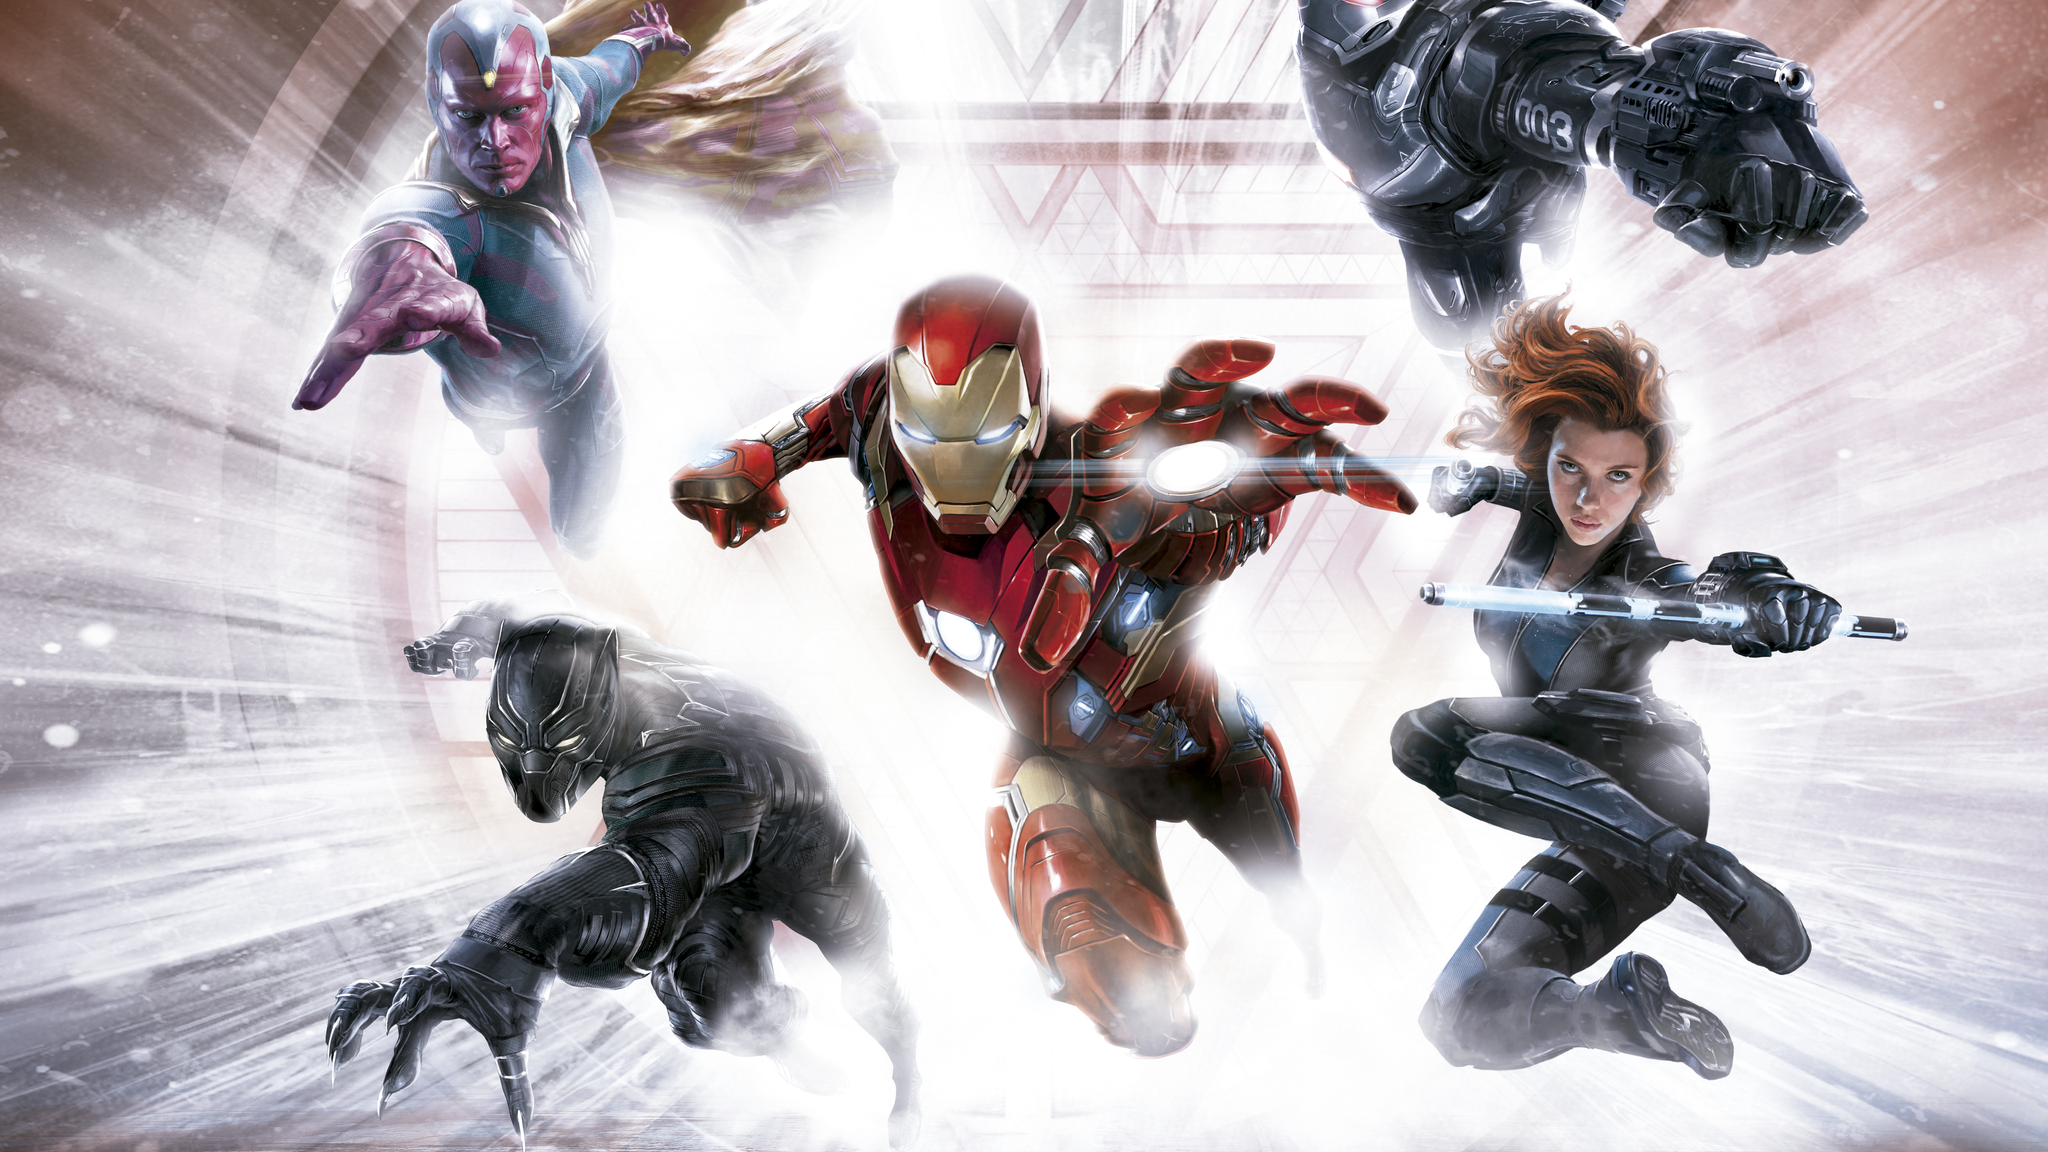 capitan-america-civil-war-team-iron-man-artwork-5k-dr.jpg